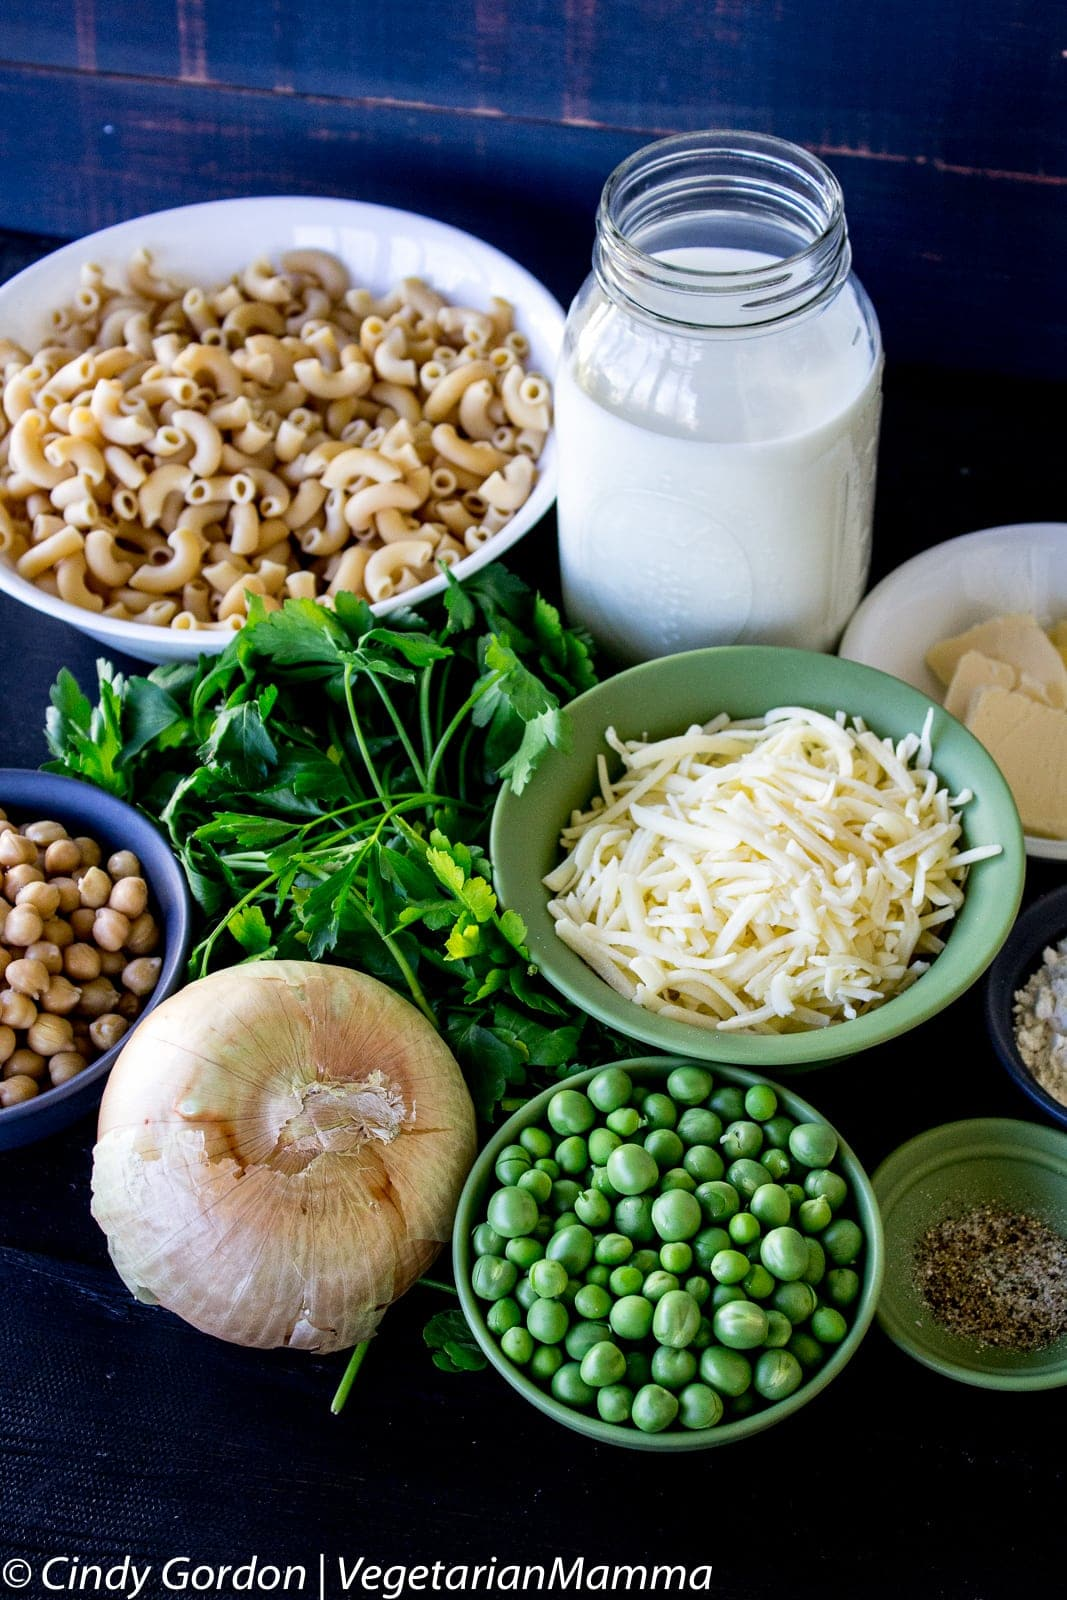 Ingredients of Vegetarian Mock Tuna Casserole